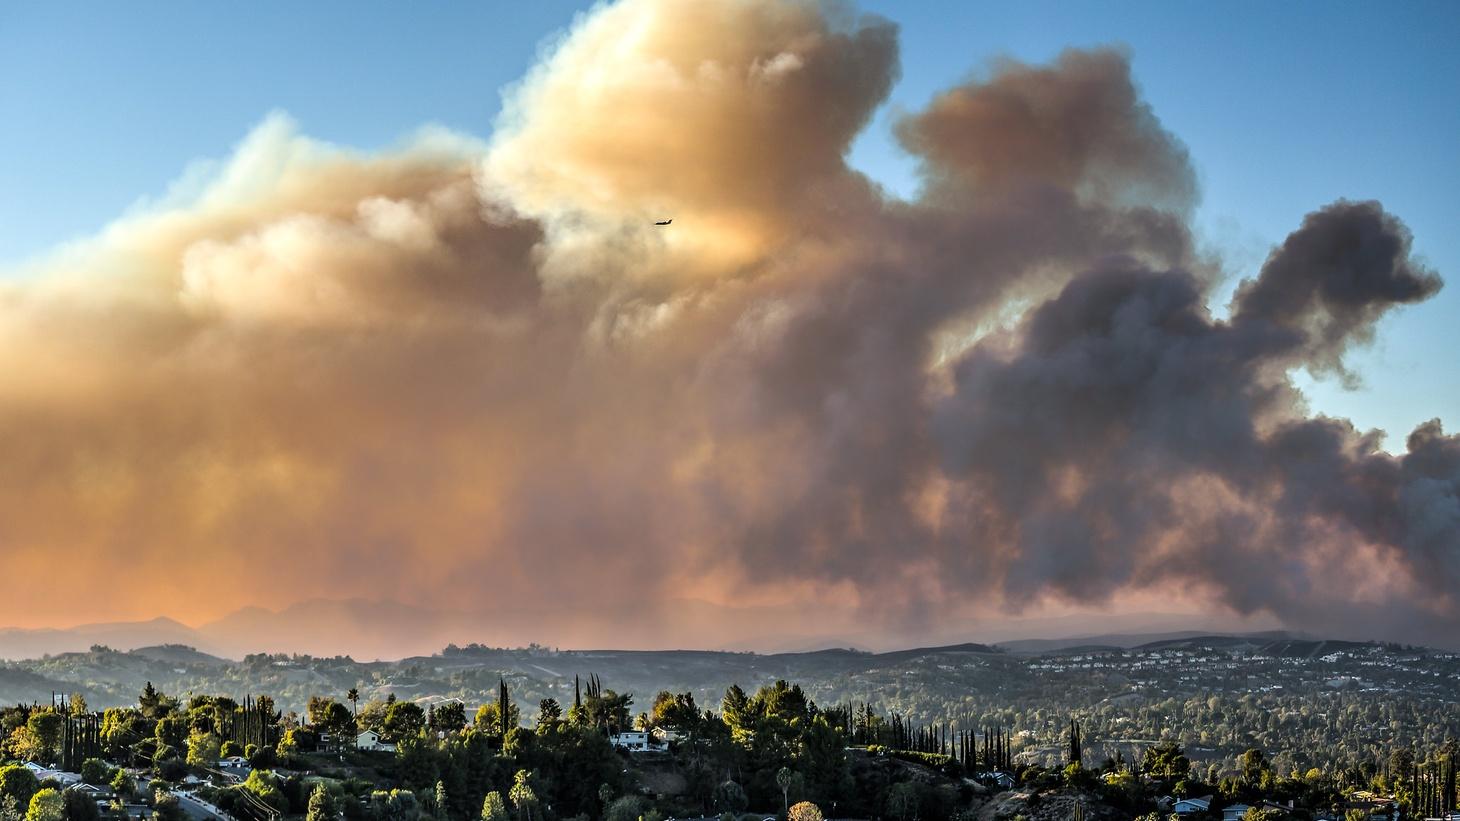 The Woolsey Fire seen from Topanga, California.